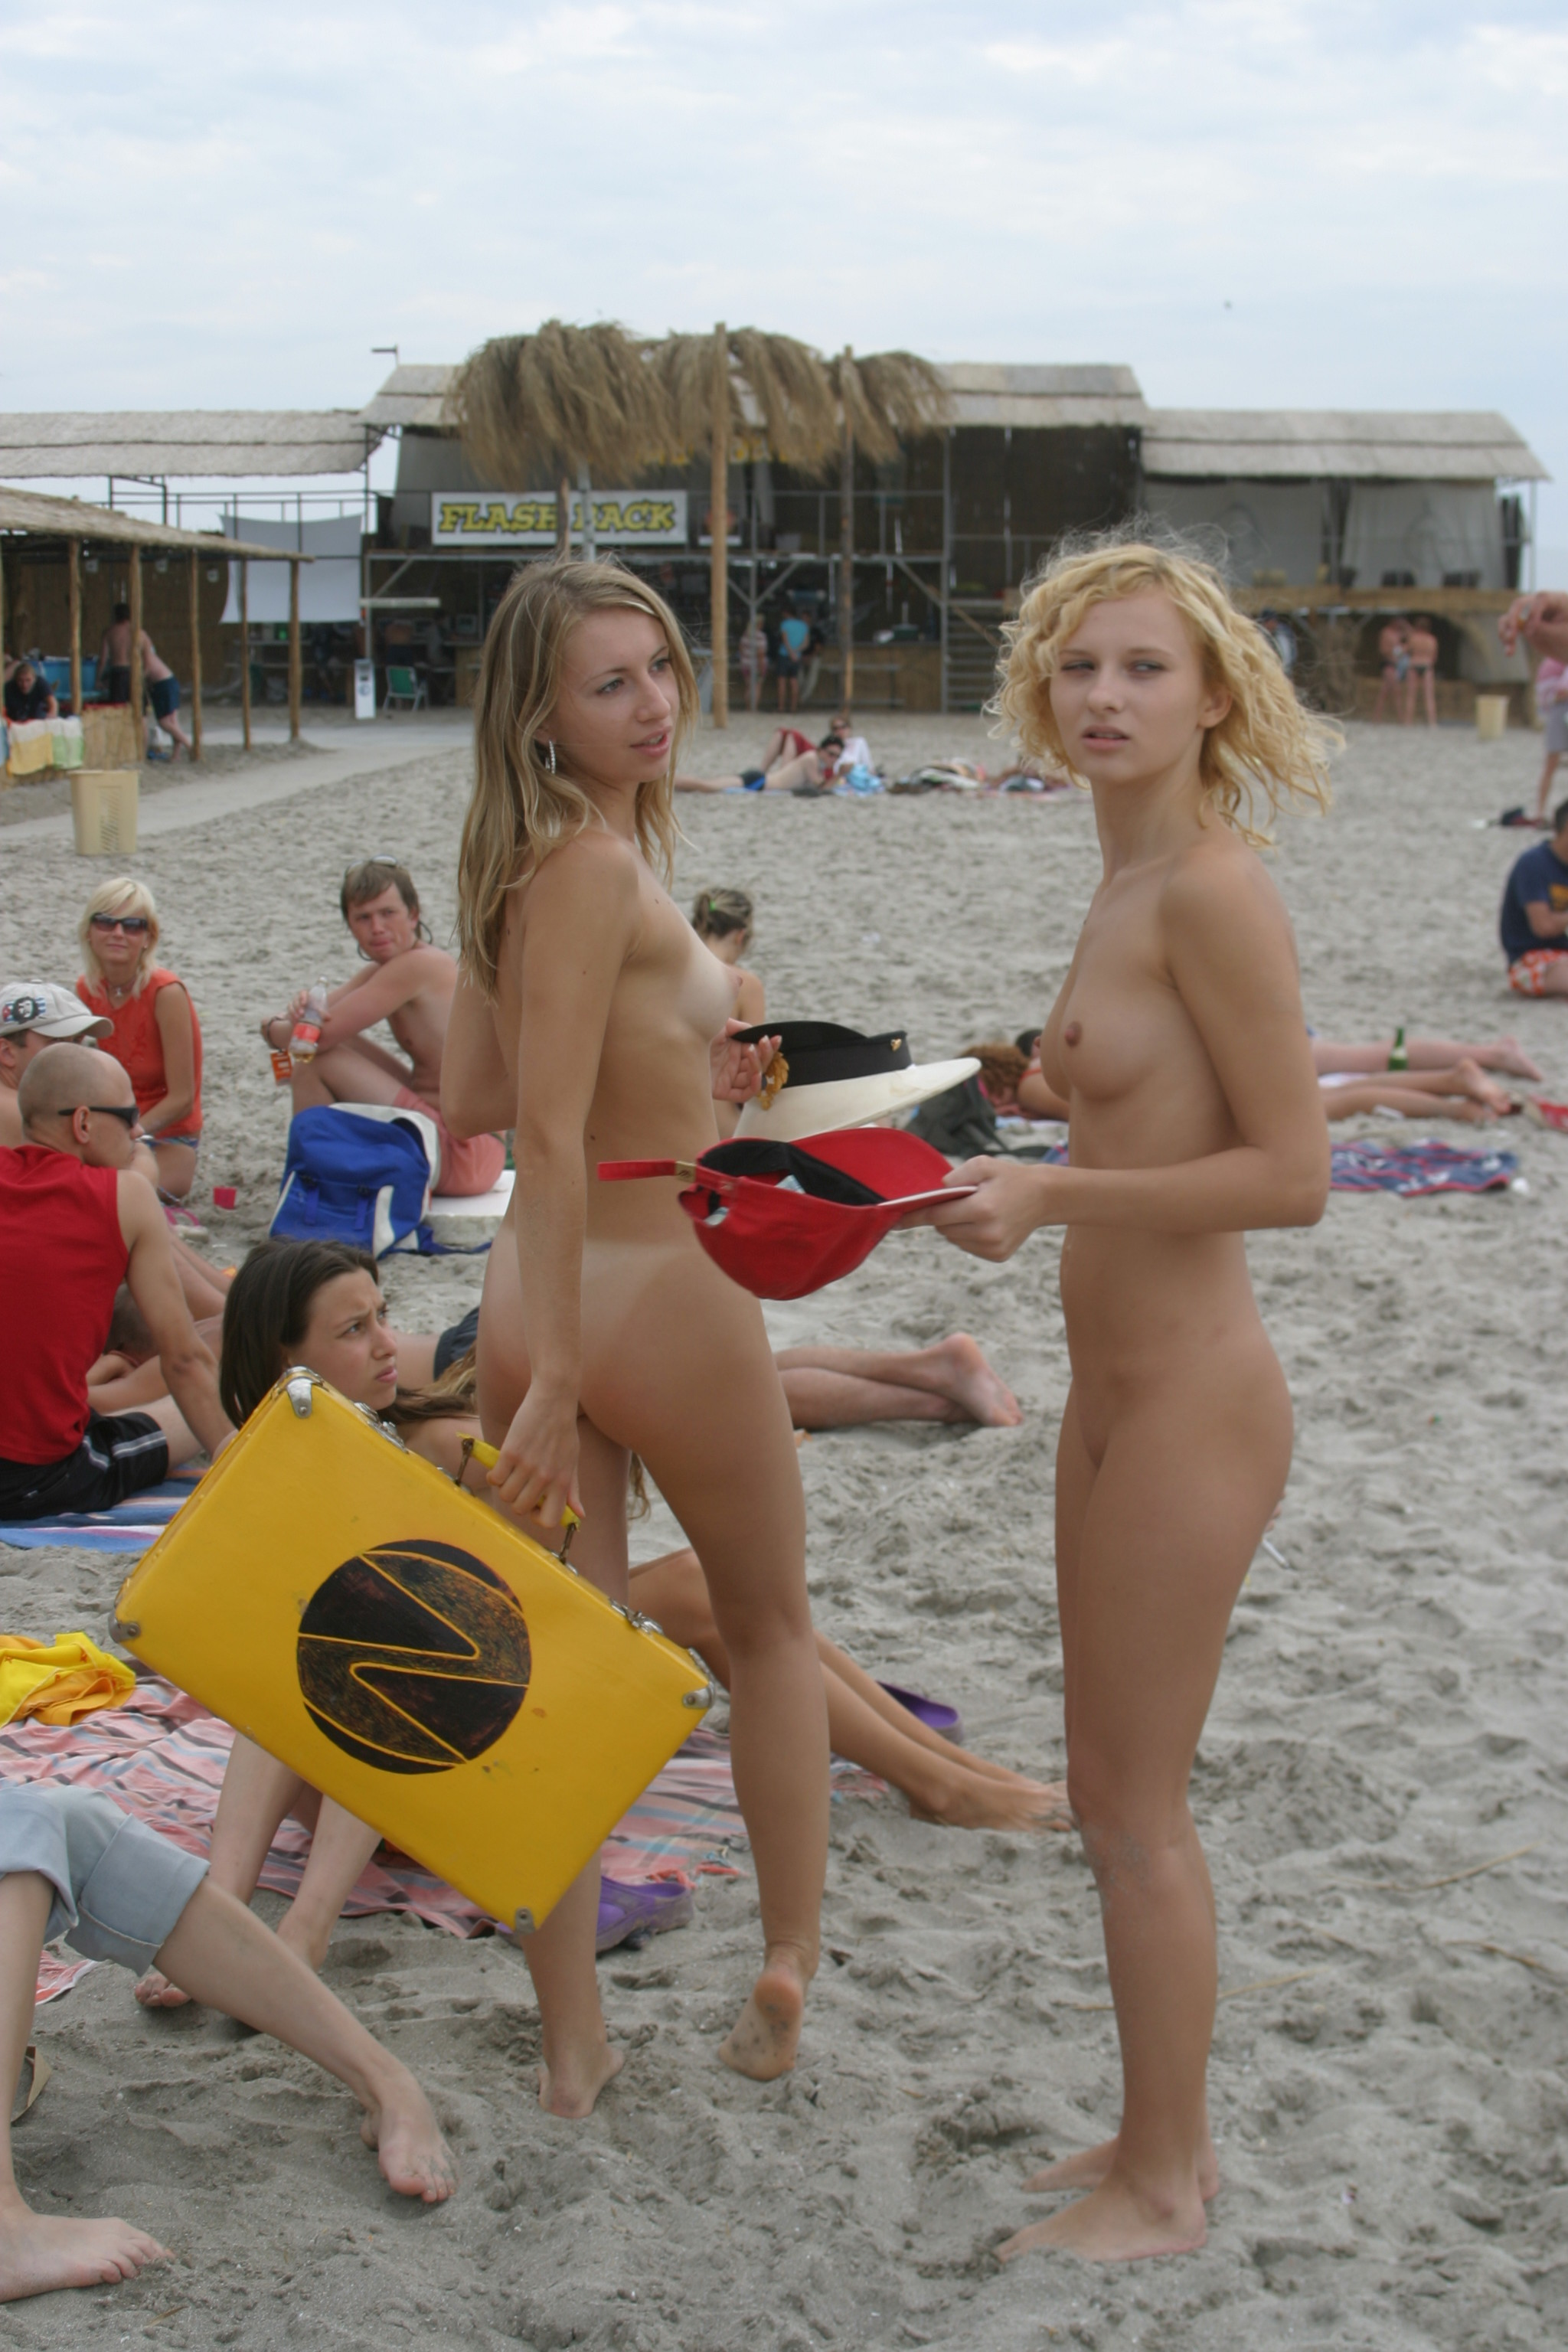 vika-y-lena-l-beach-nude-in-public-metart-37